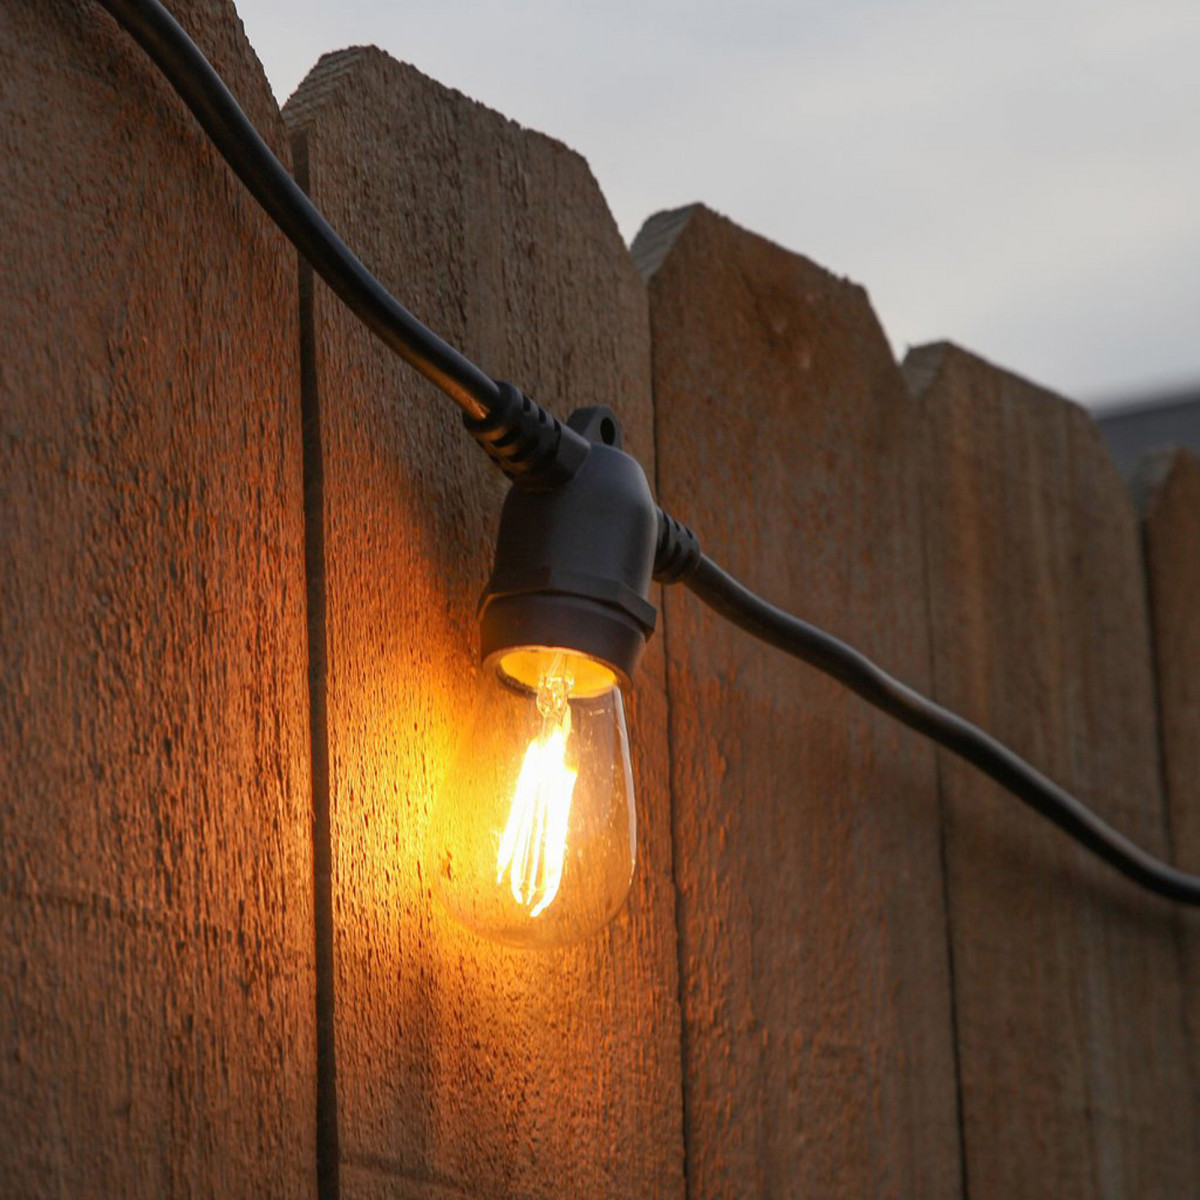 Feestverlichting LED Patio 20 helder - 20 meter / 24 fittingen